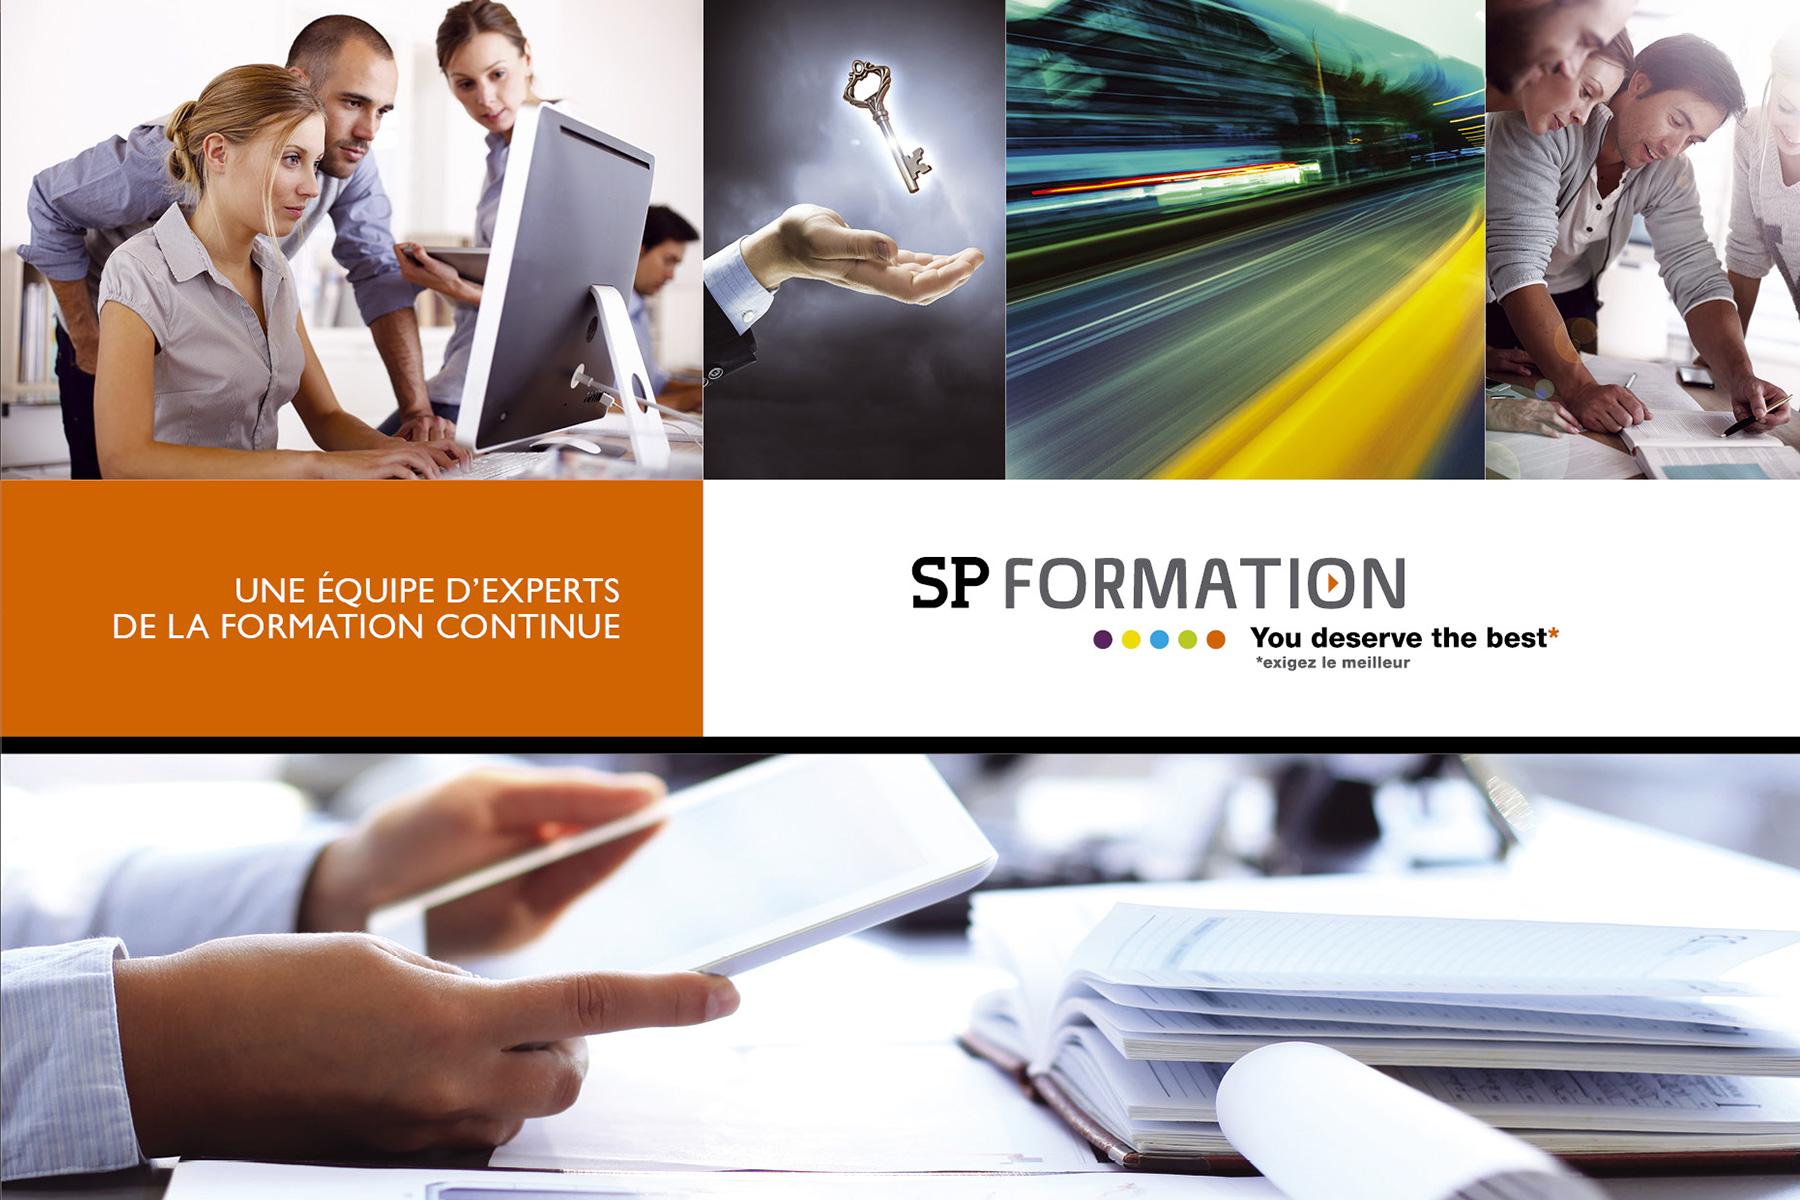 Présentation SP FORMATION